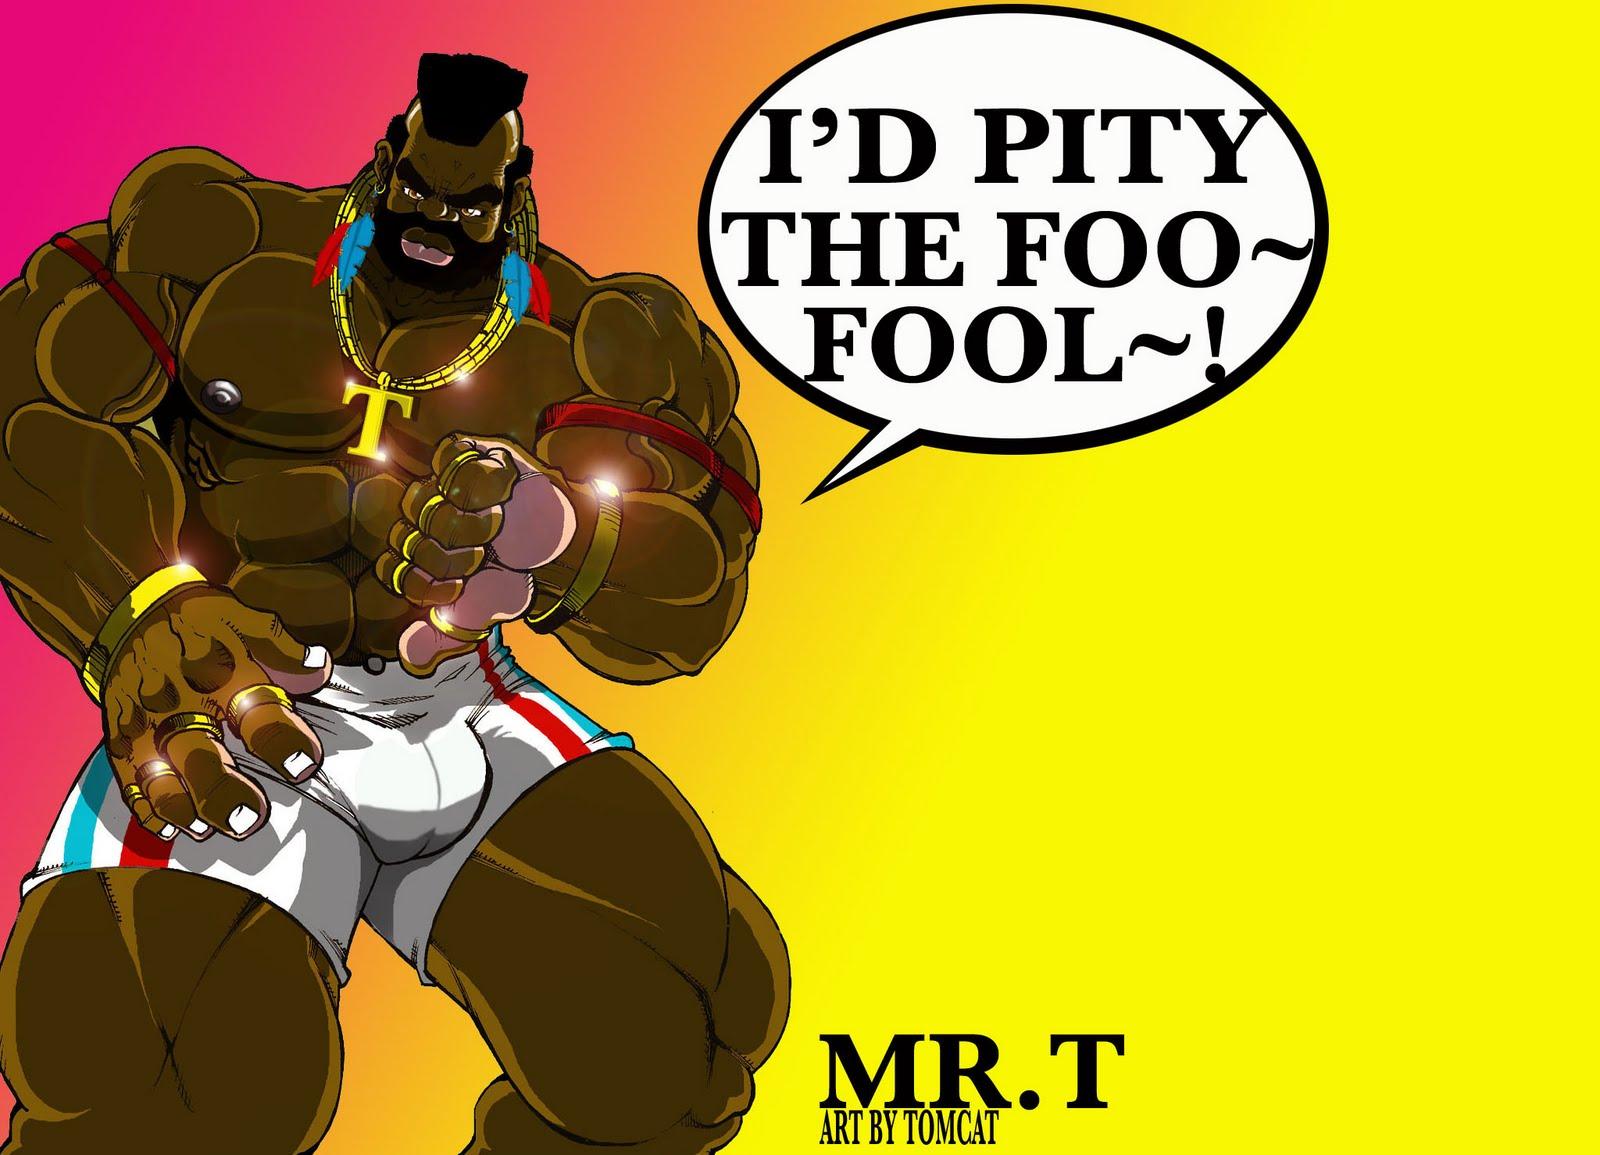 And MR. T. Do you LOVE Video Games~? Do I? i have a Playstation,